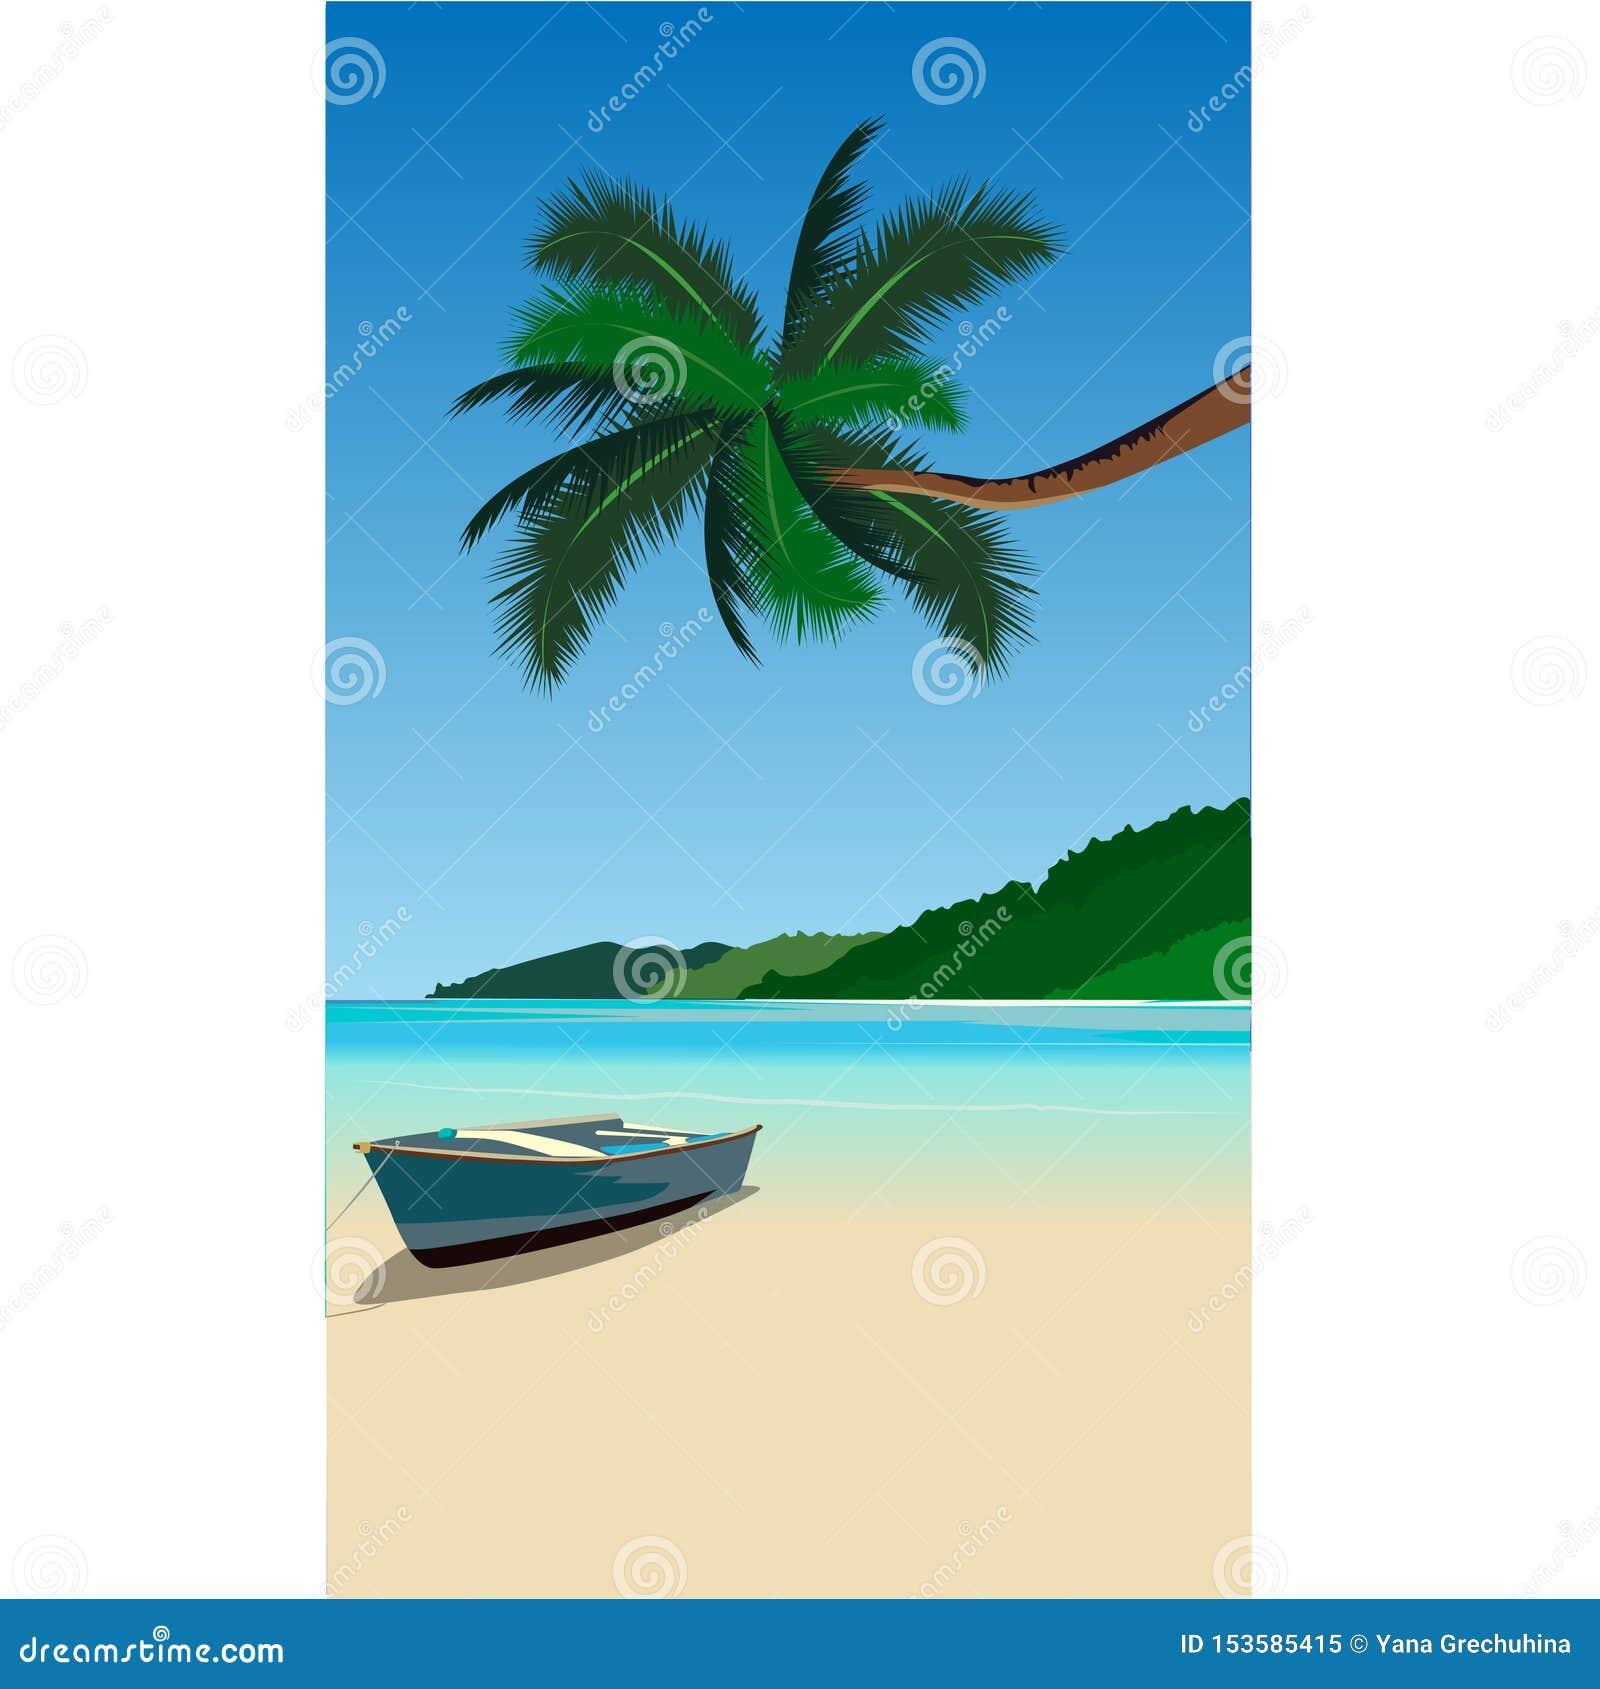 Nature azure beach palm tree shore wave boa